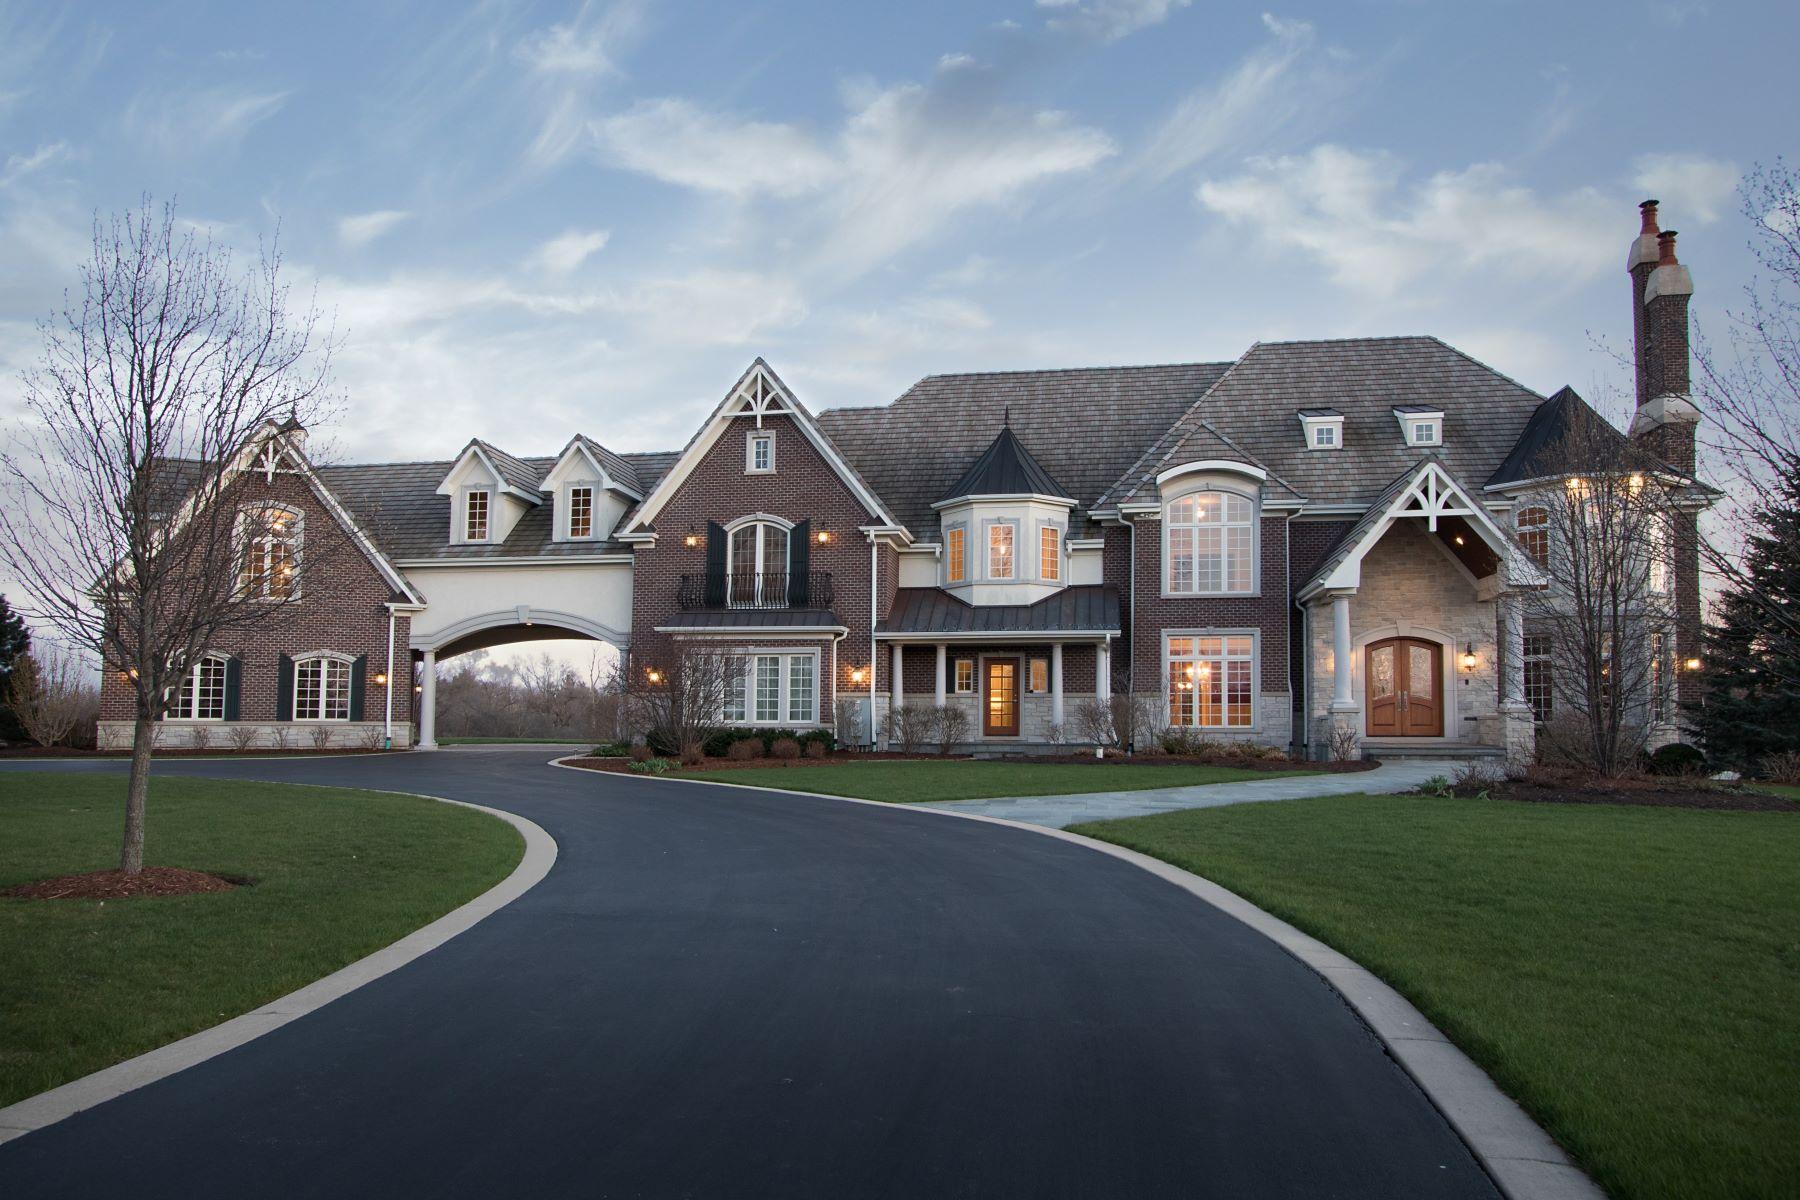 Casa Unifamiliar por un Venta en 73 Otis Road Barrington Hills Barrington Hills, Illinois, 60010 Estados Unidos